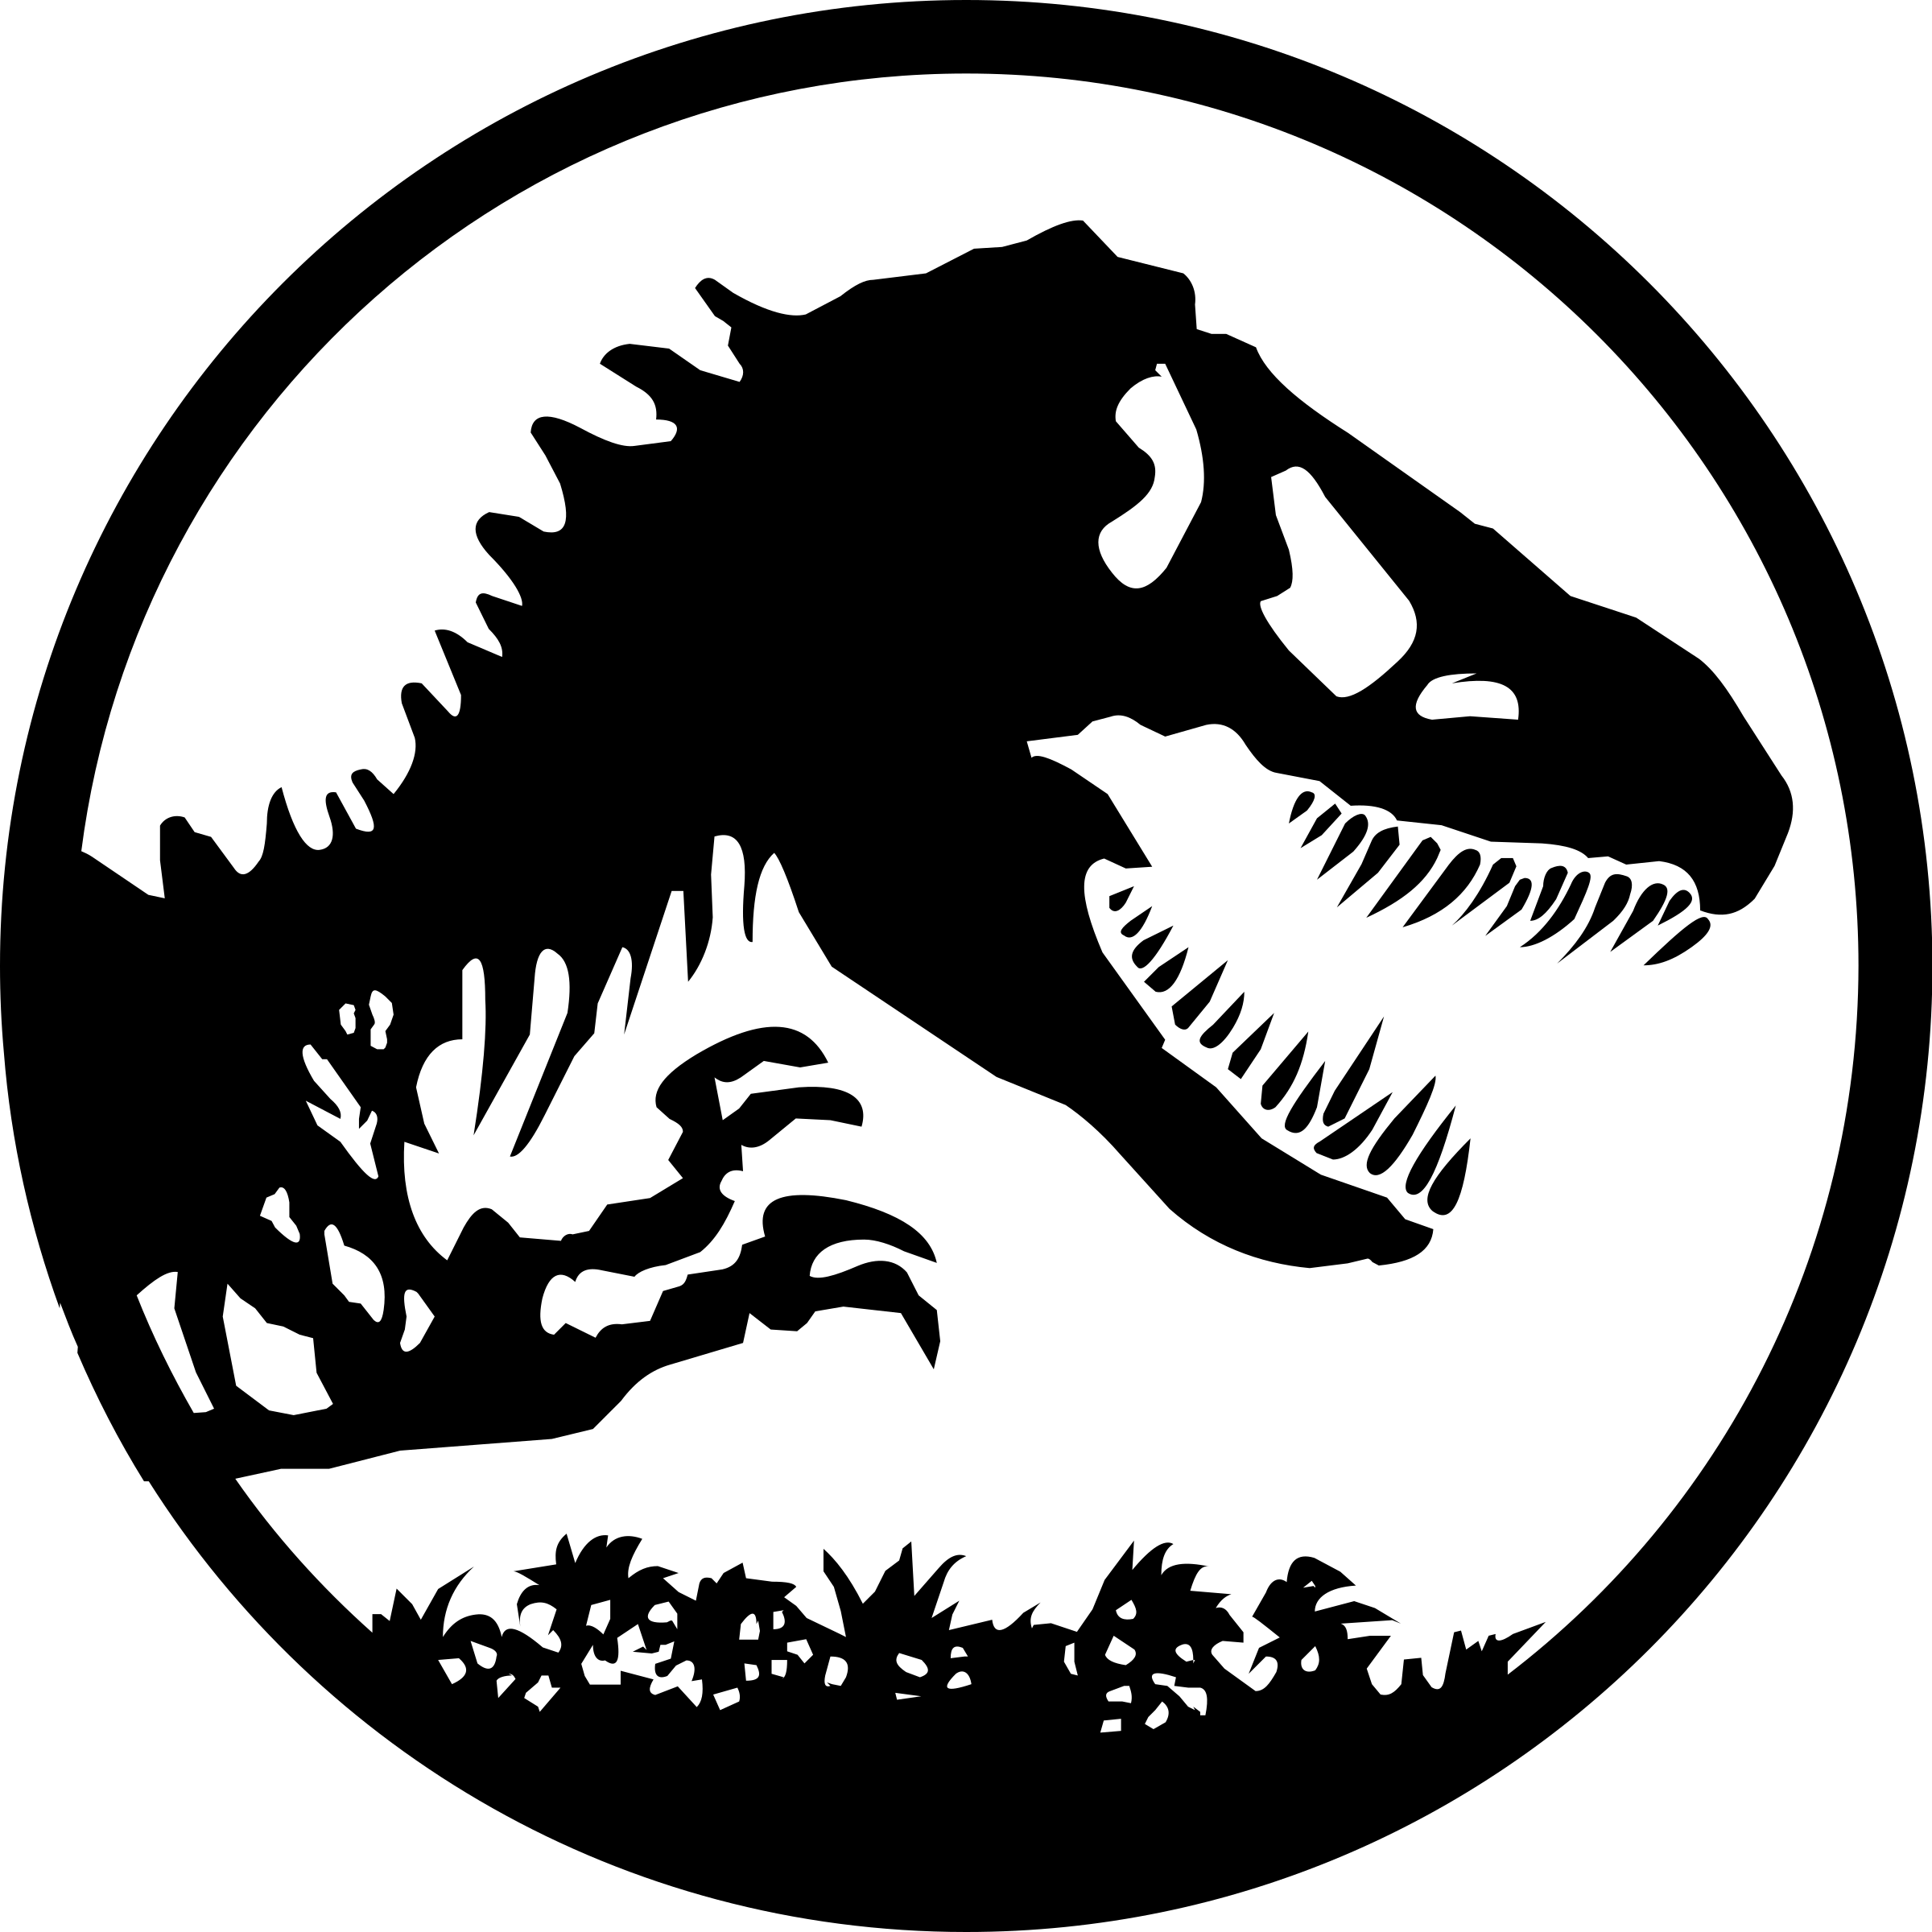 World vector png. Jurassic logo transparent svg